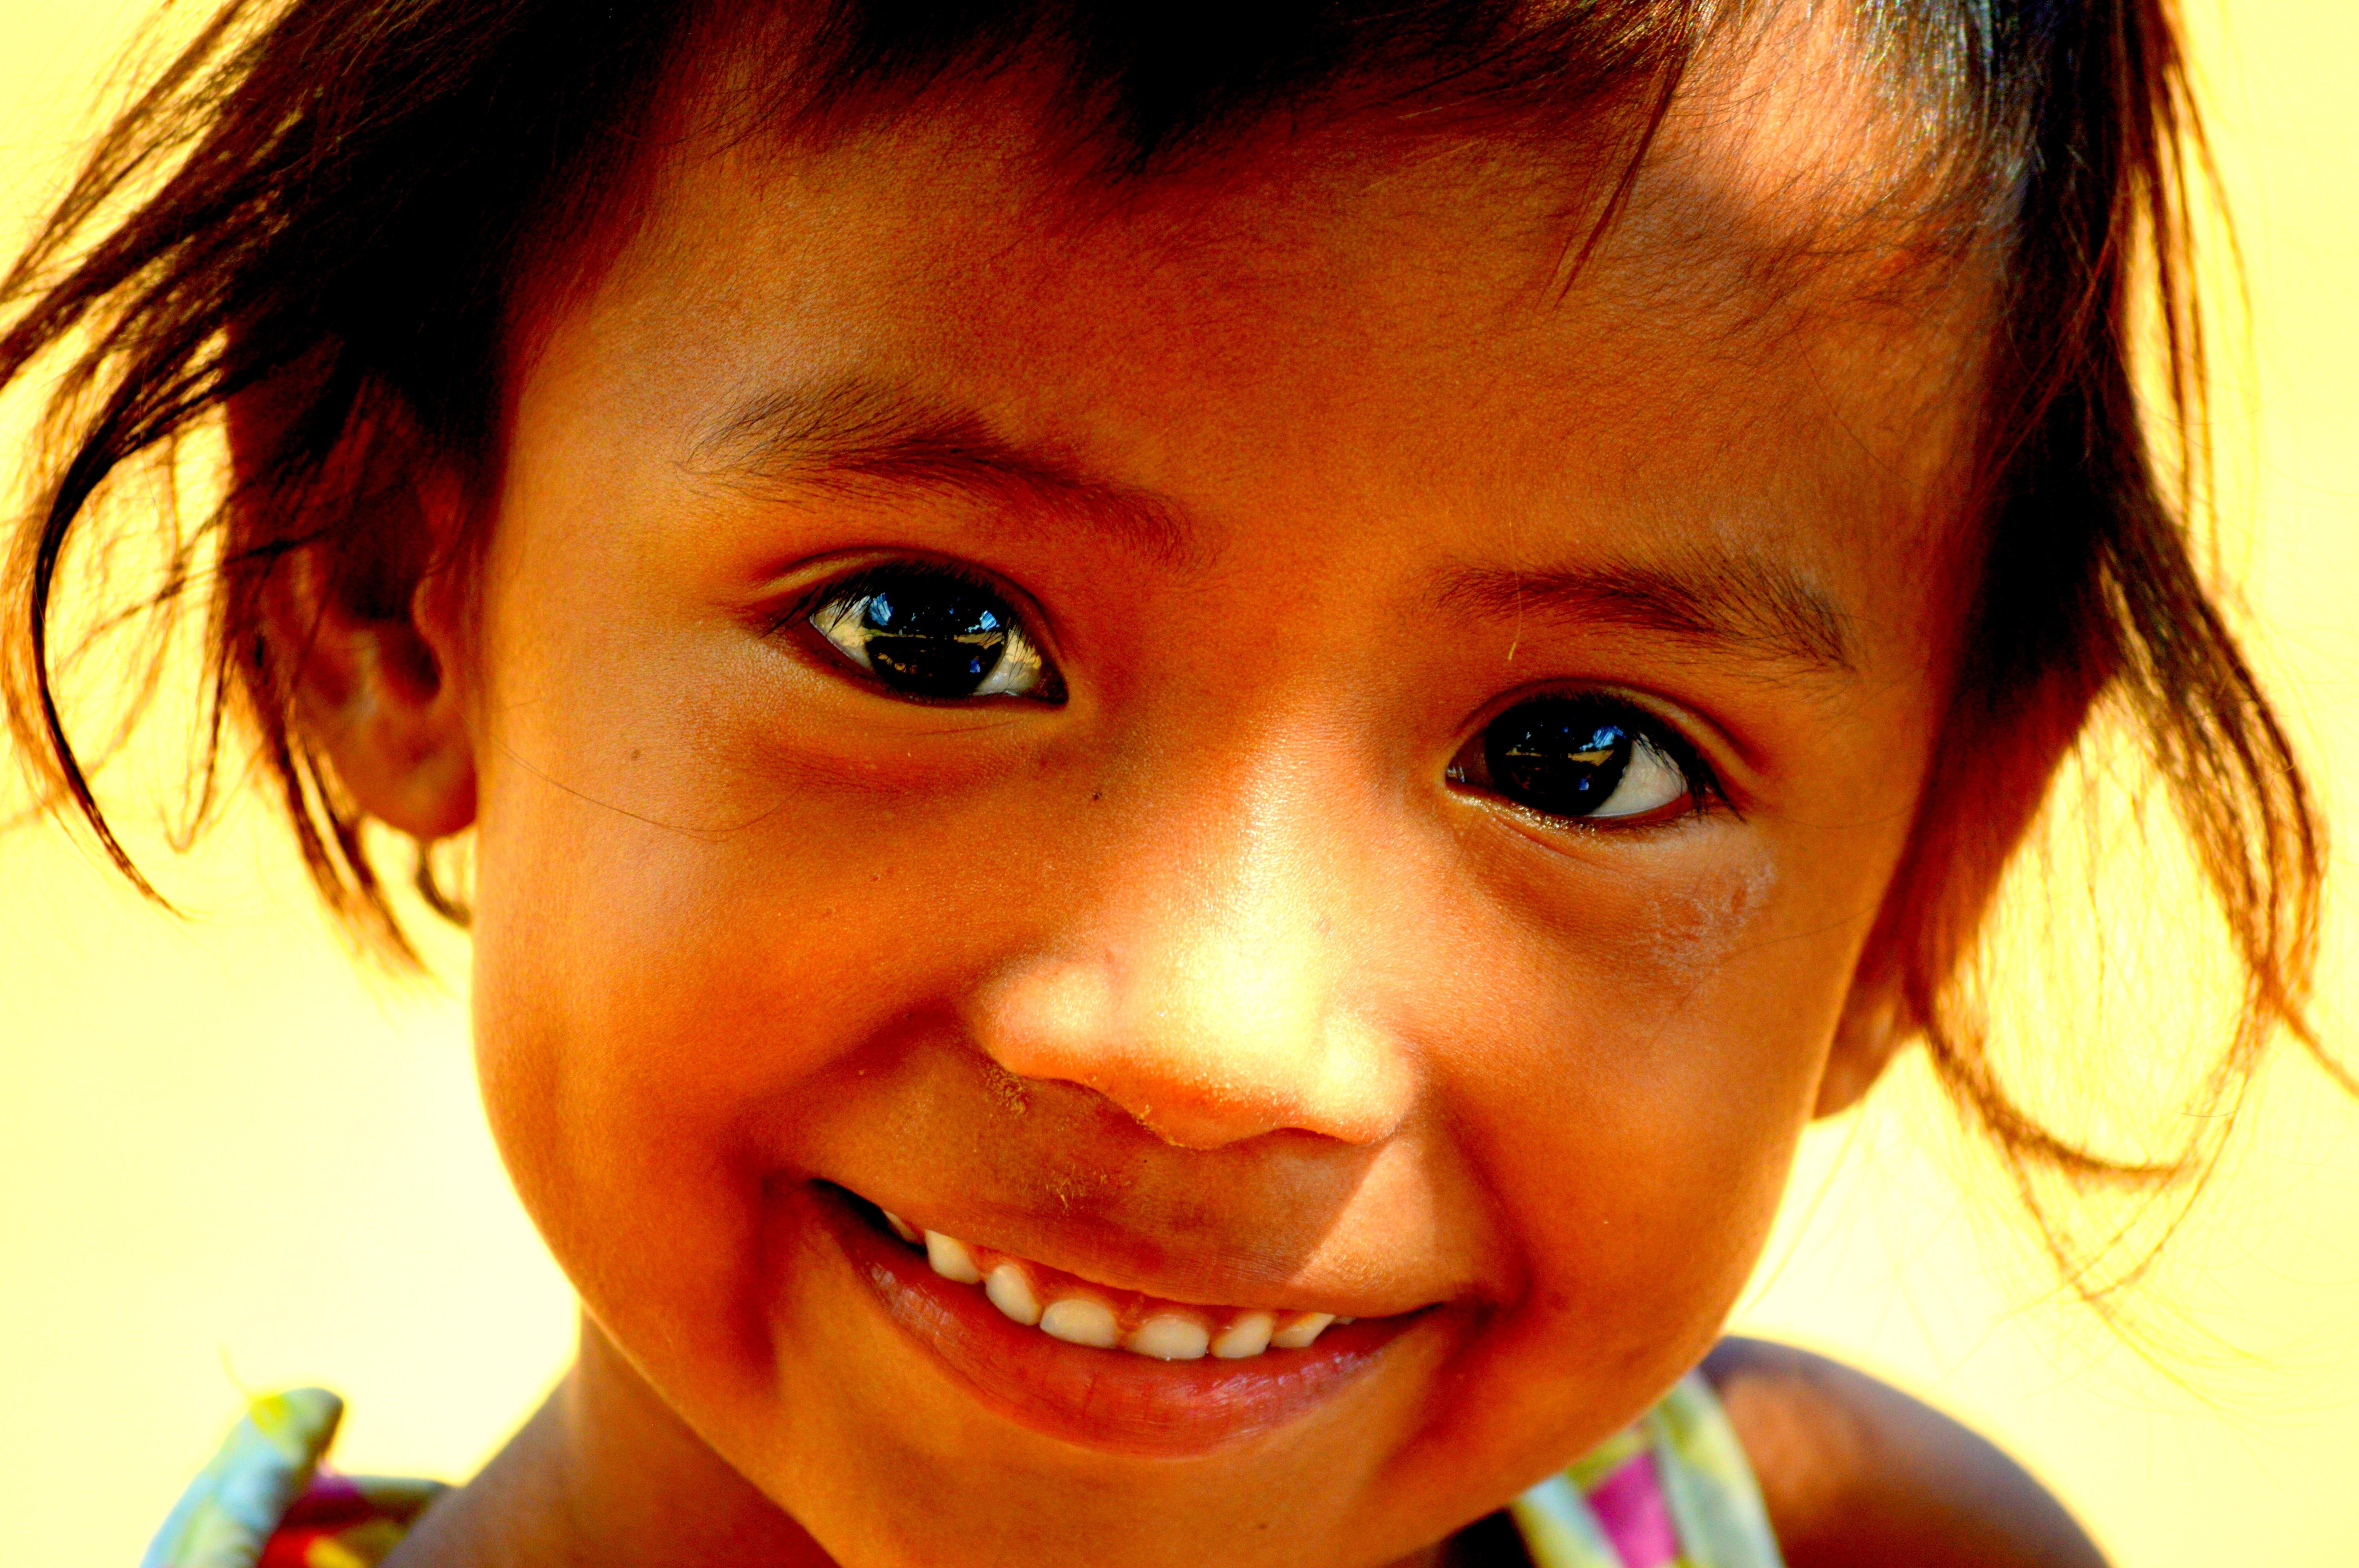 Free Images : person, girl, hair, portrait, color, child ...